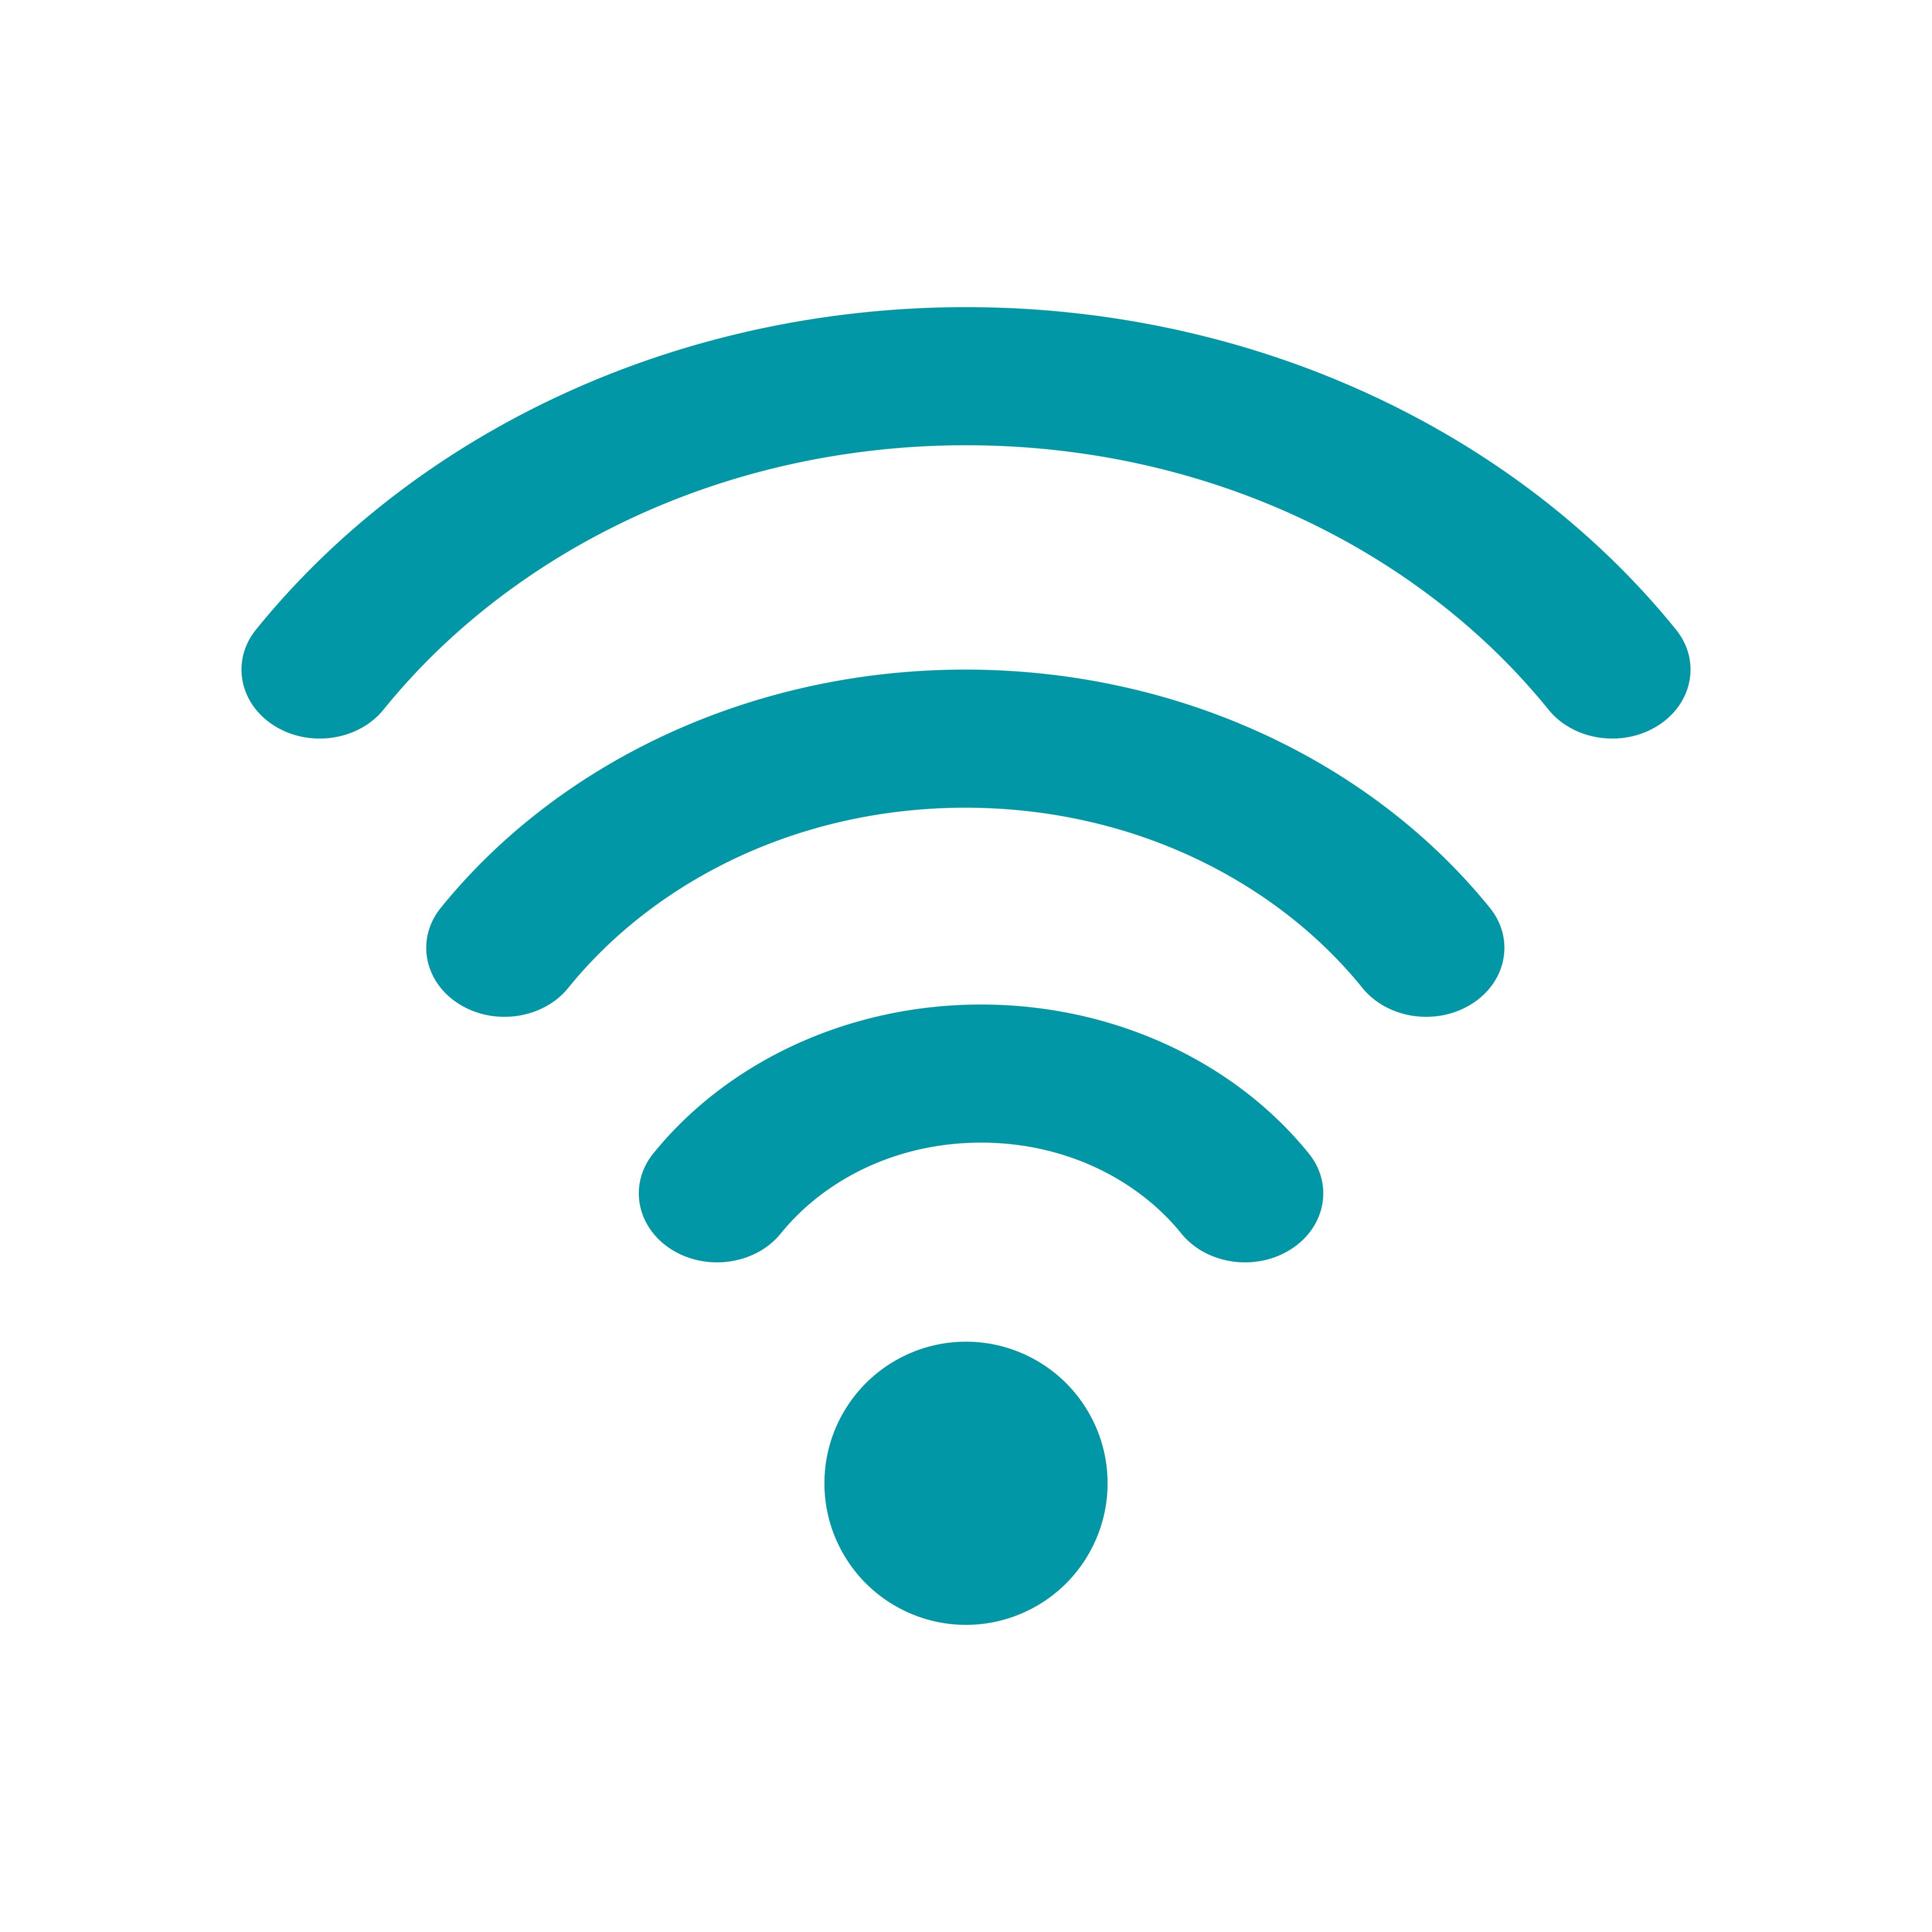 Wifi Vector Icon - Download Free Vectors, Clipart Graphics ...